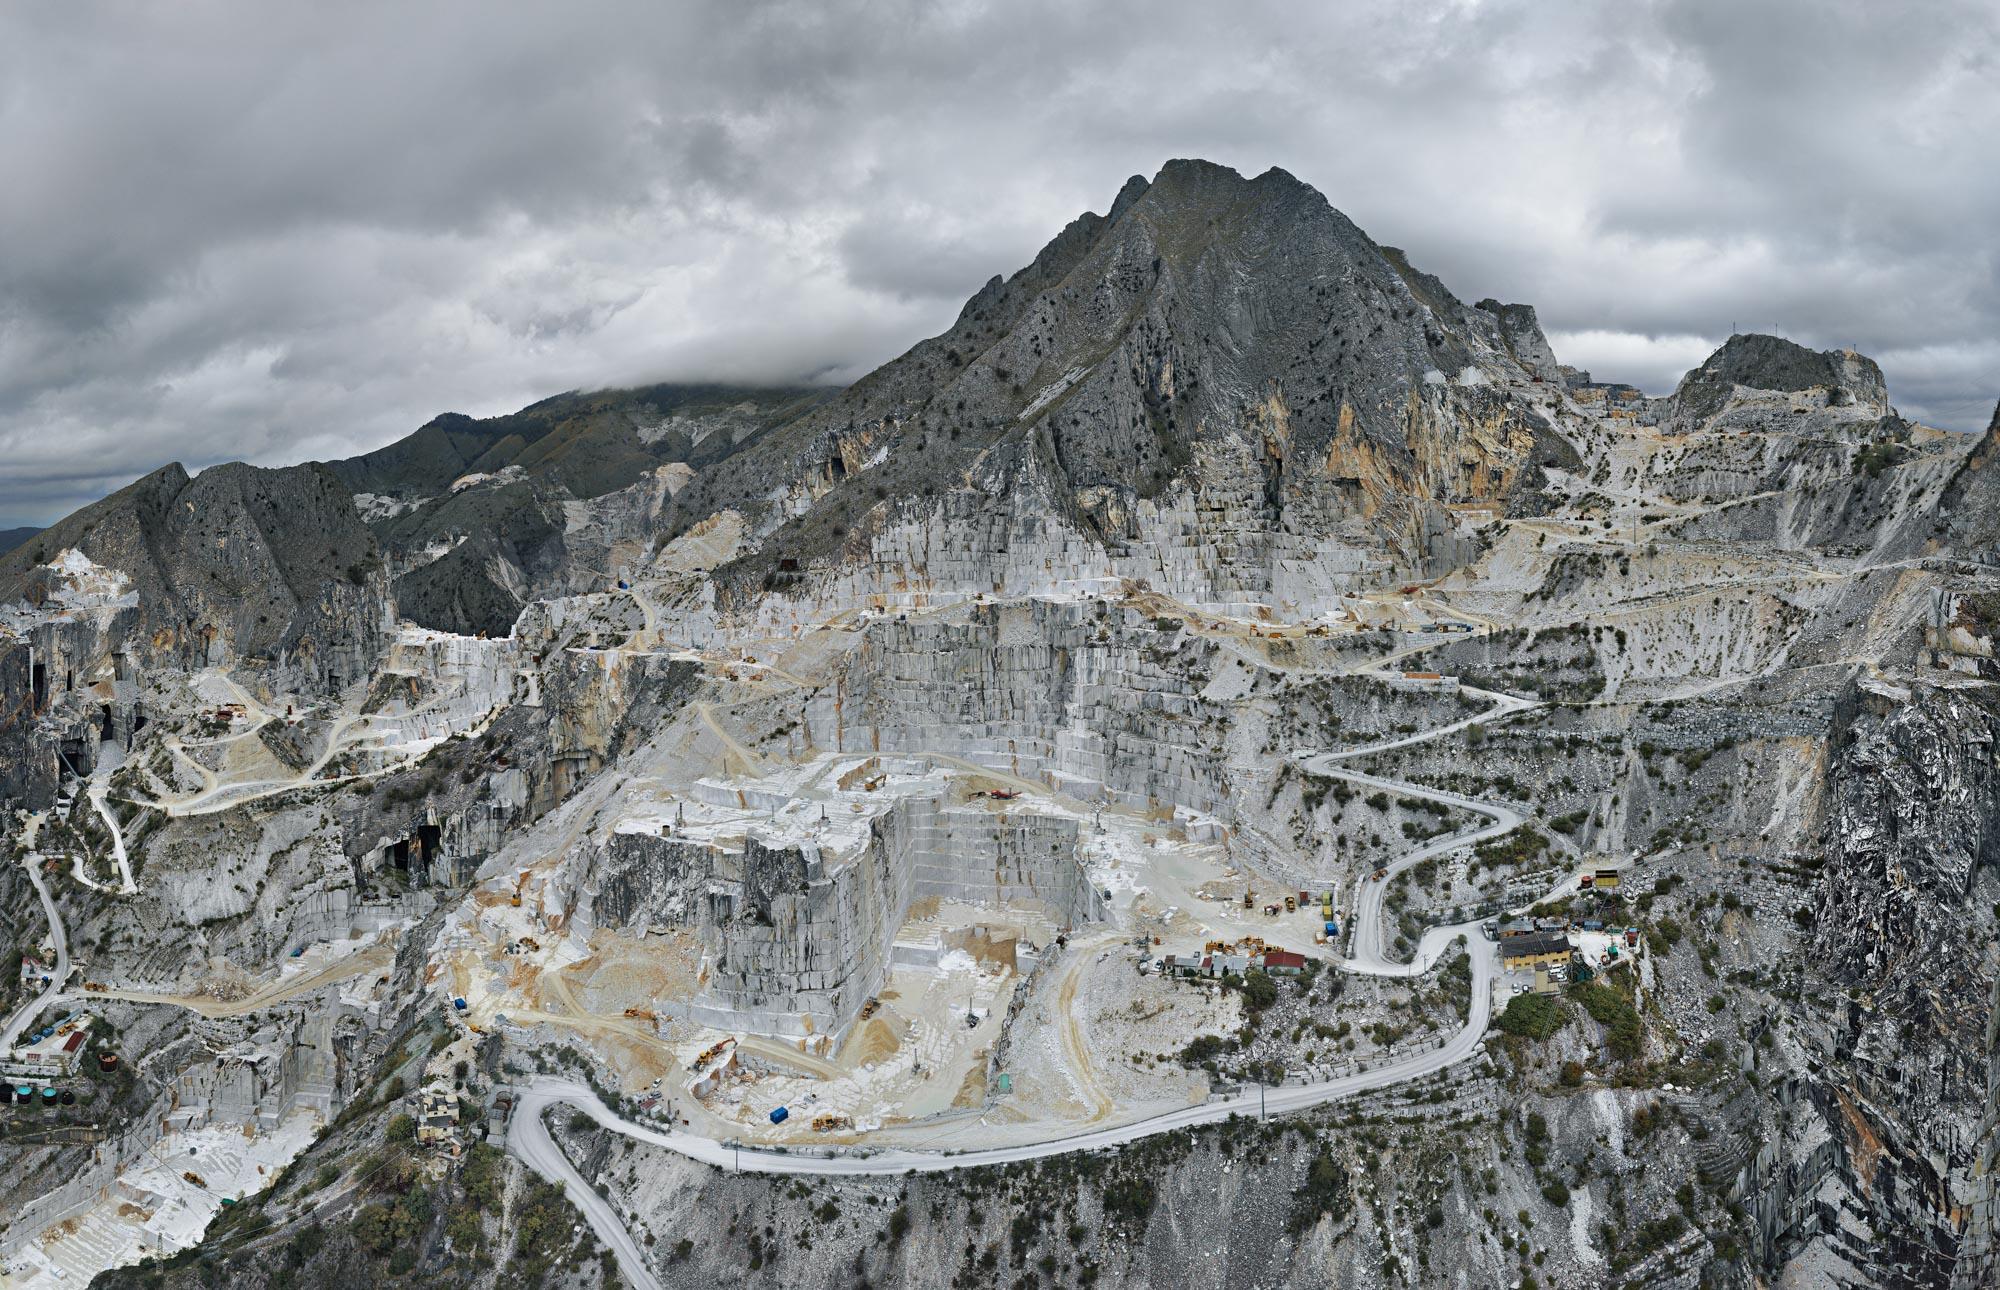 Carrara Marble Quarries, Carbonera Quarry #1, Carrara, Italy, 2016